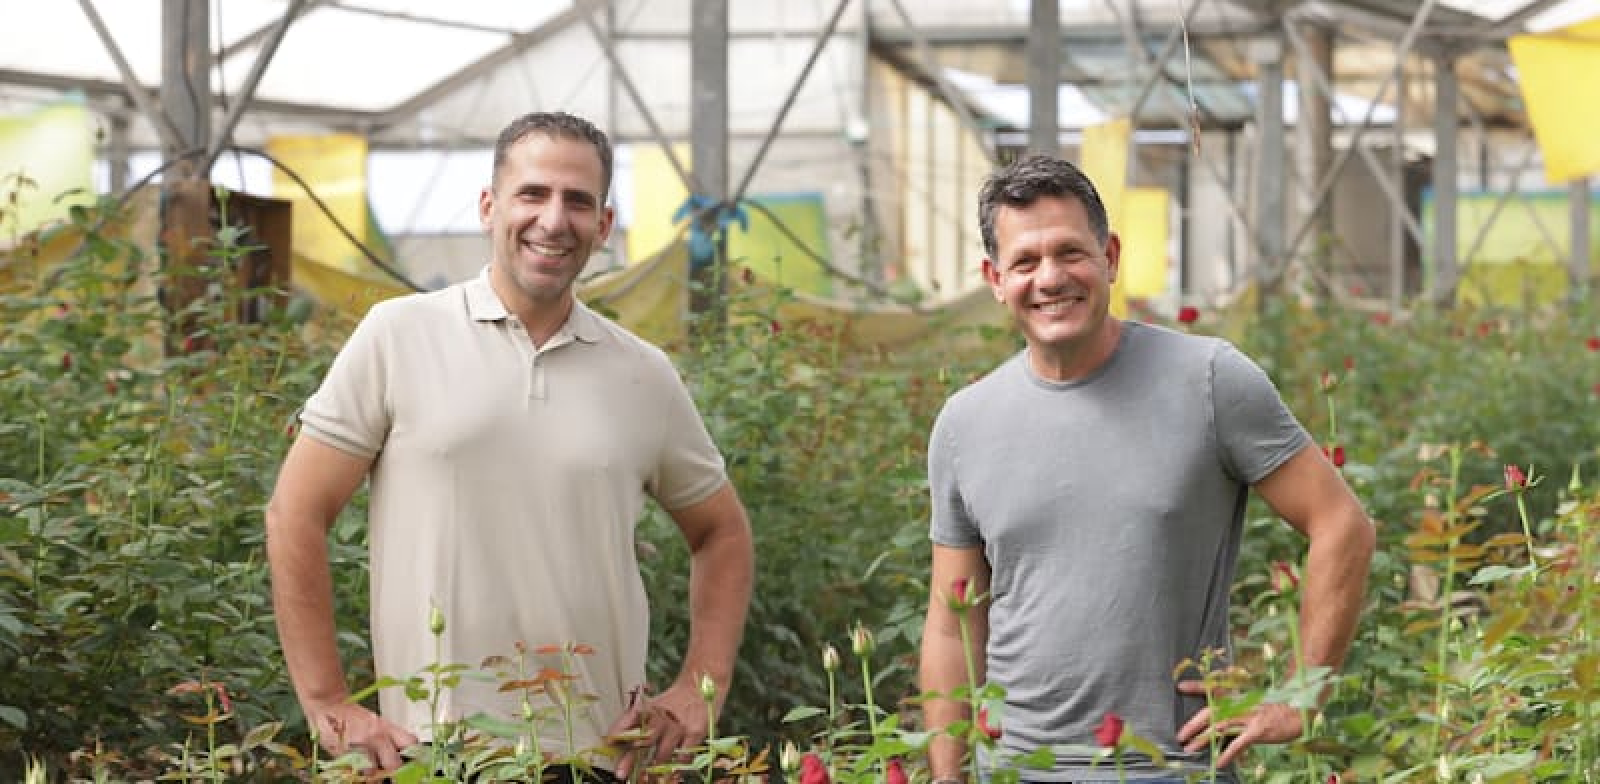 Yoav Ben Yakar and Roi Eliyahu Photo: Tomer Aviv